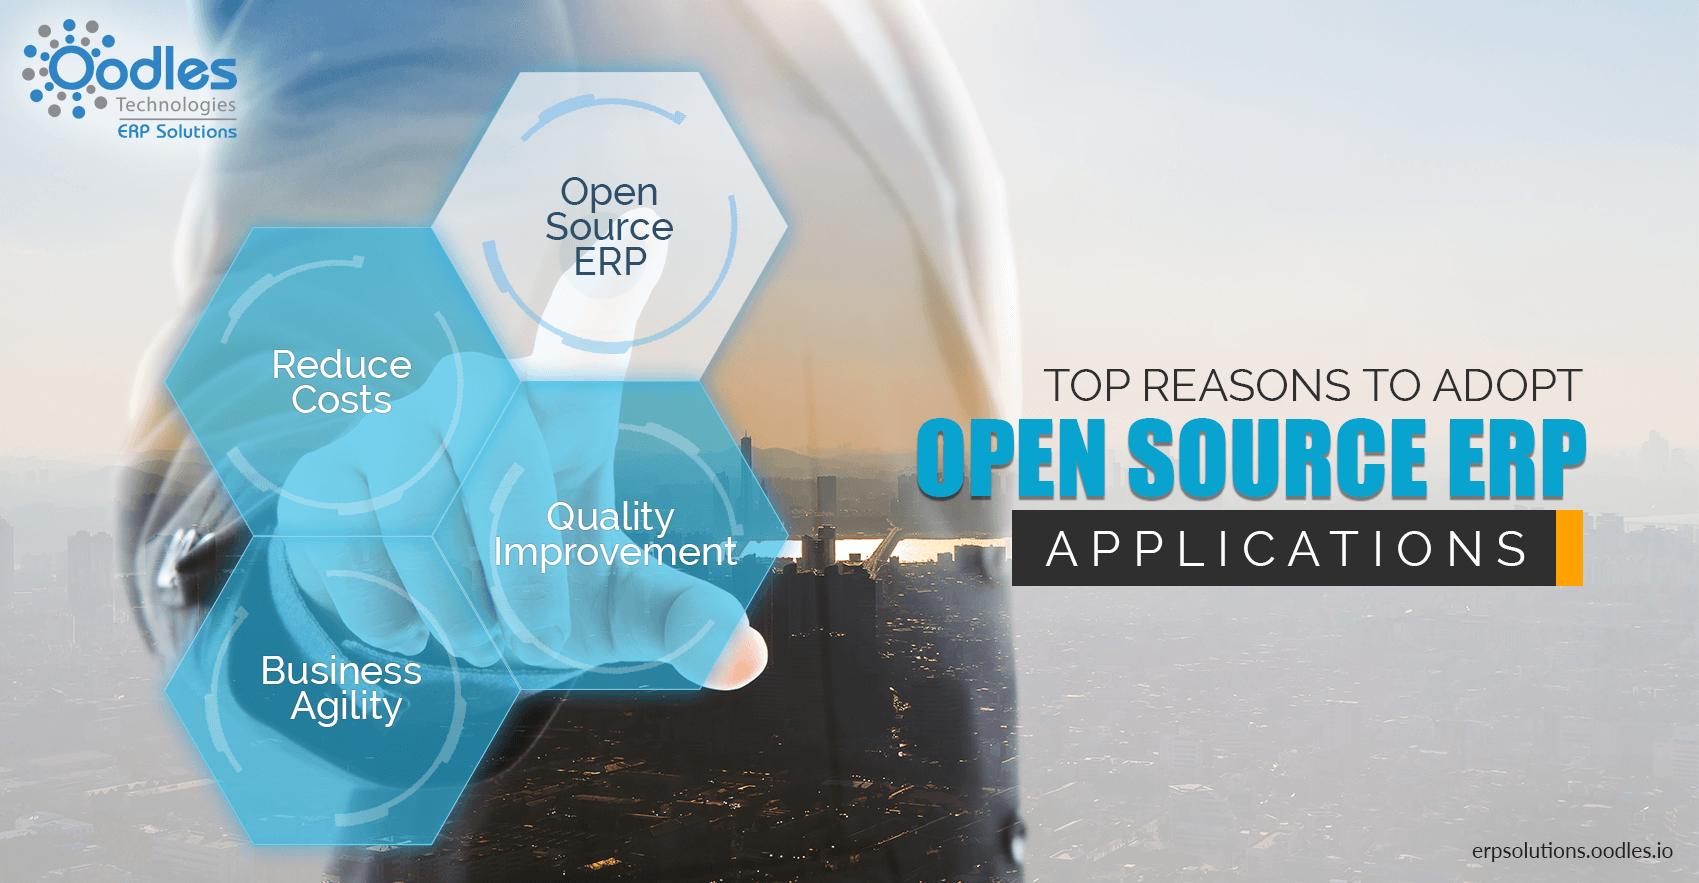 Open Source ERP applications